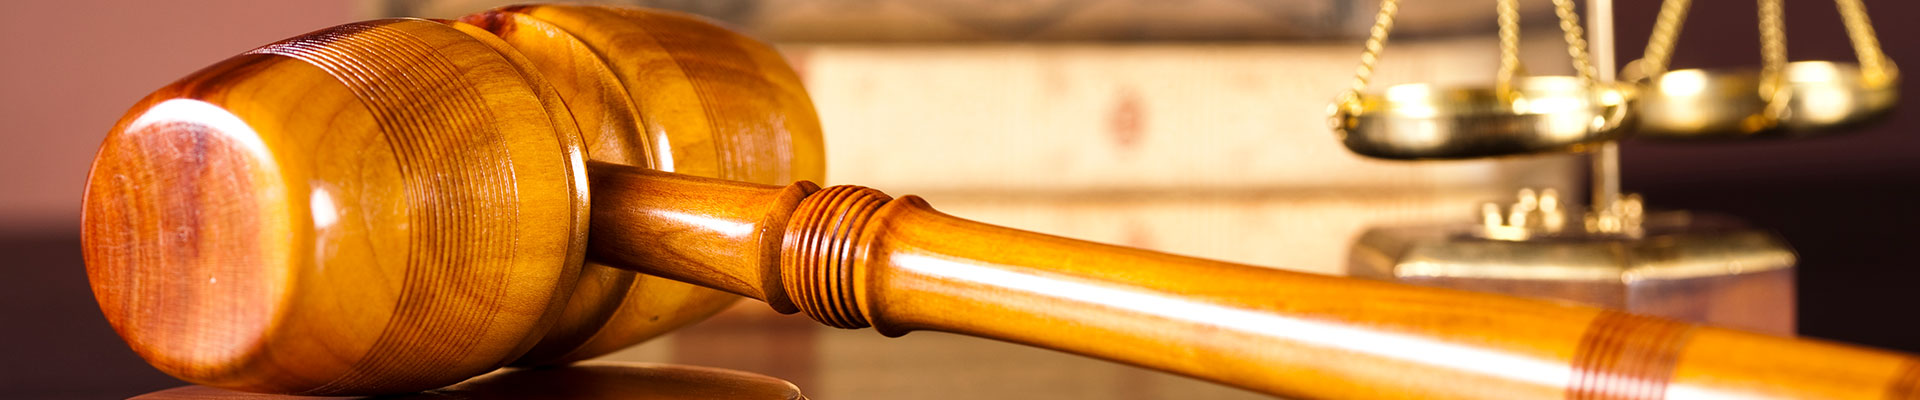 Dram Shop Liability Lawyer | Mankato Personal Injury Lawyer